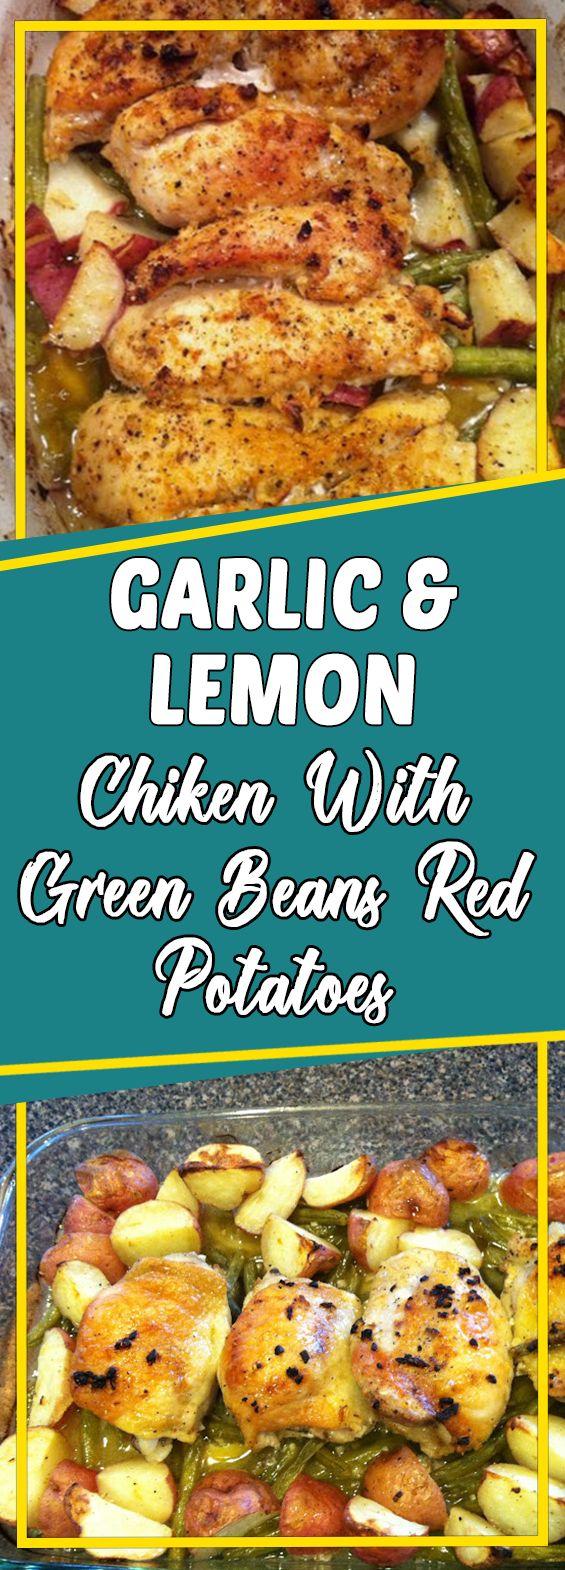 211 best Chicken Recipes images on Pinterest | Chicken recipes ...